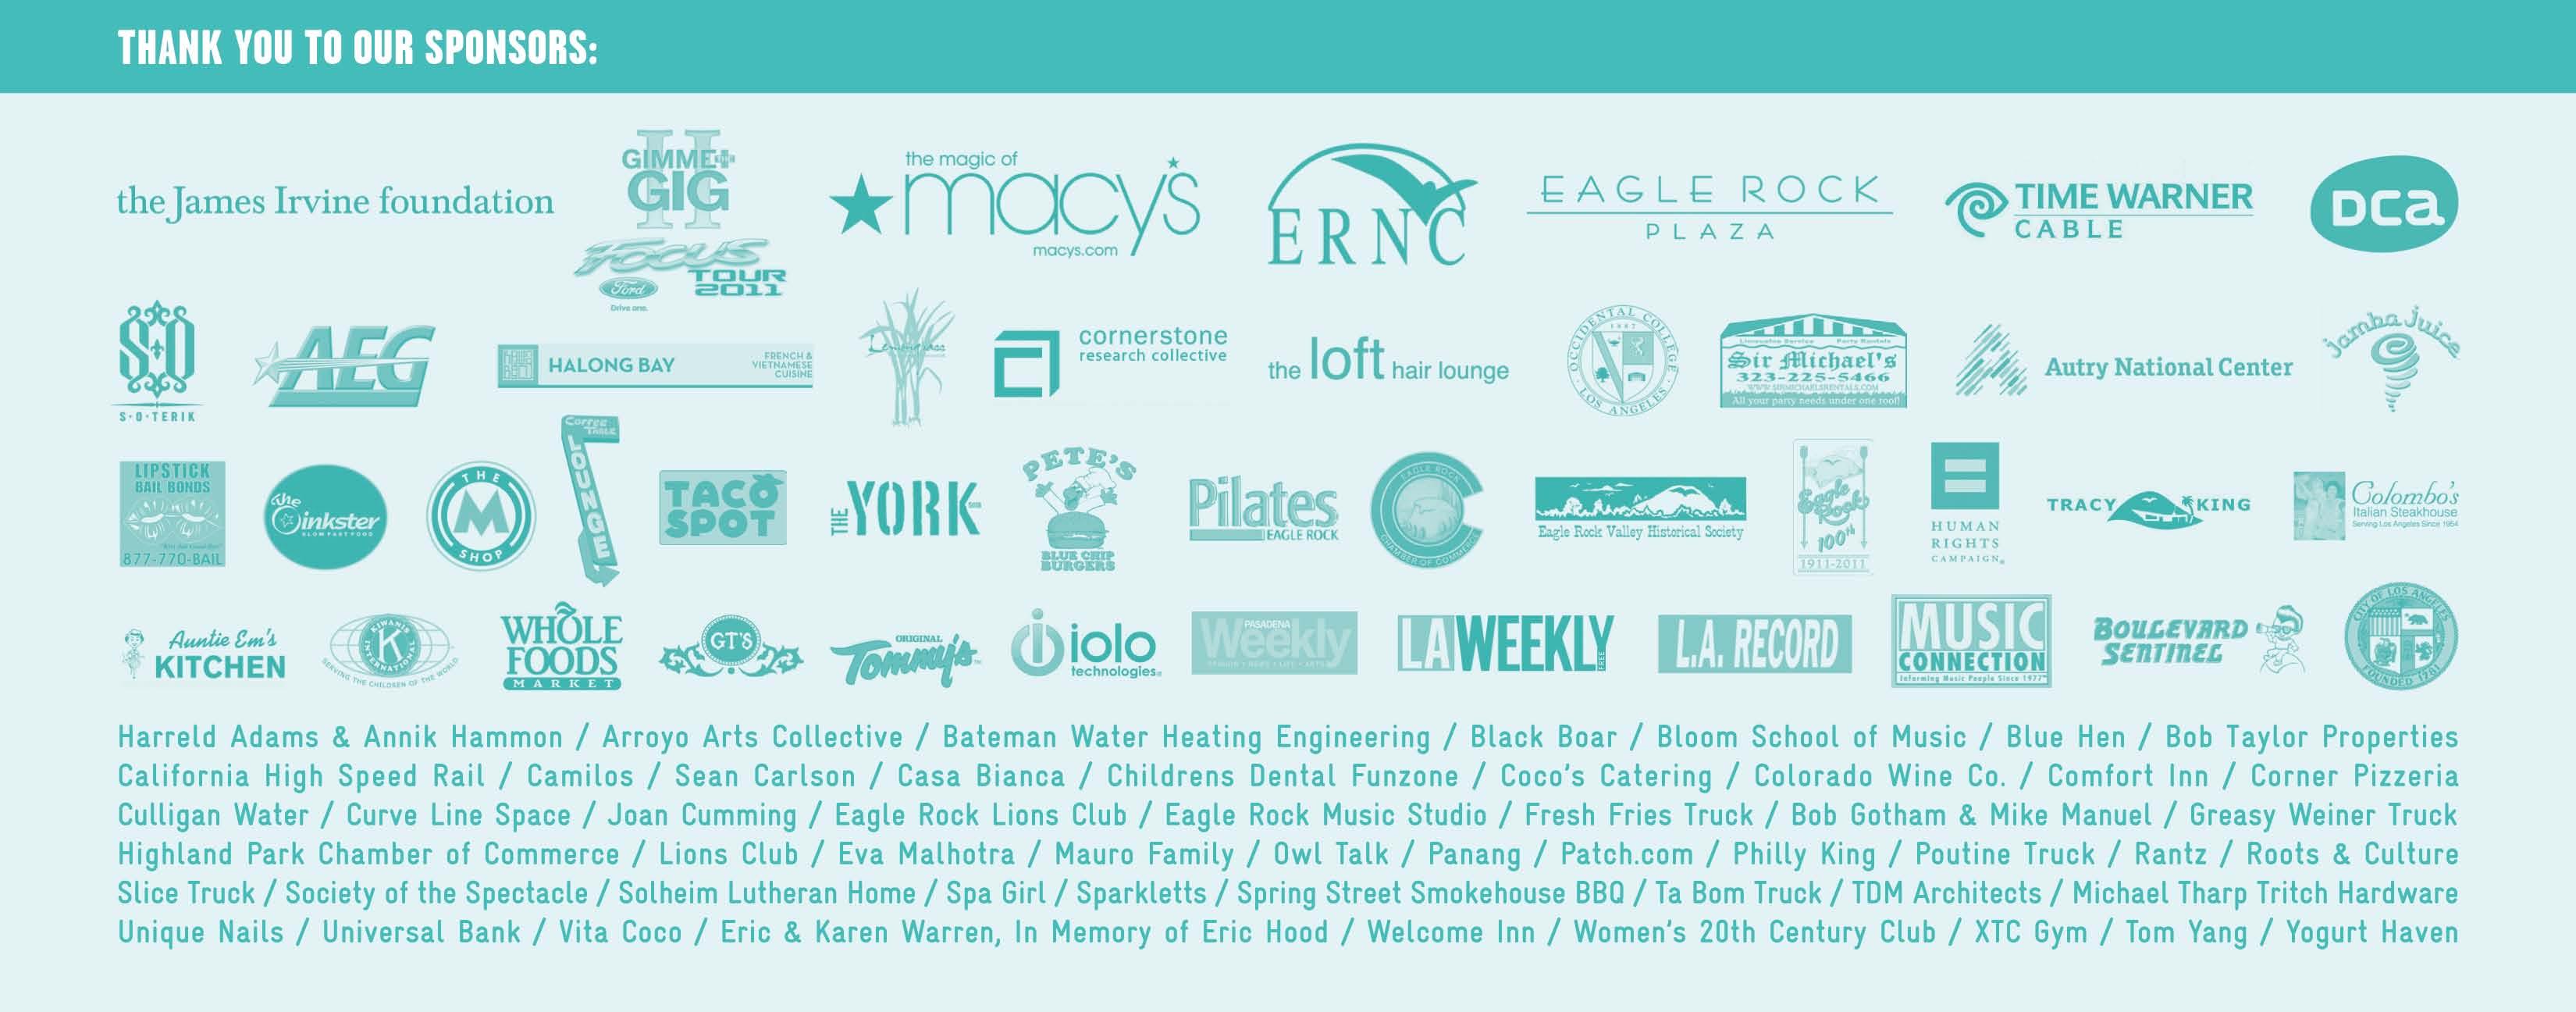 Eagle Rock Music Festival | Eagle Rock Music Festival